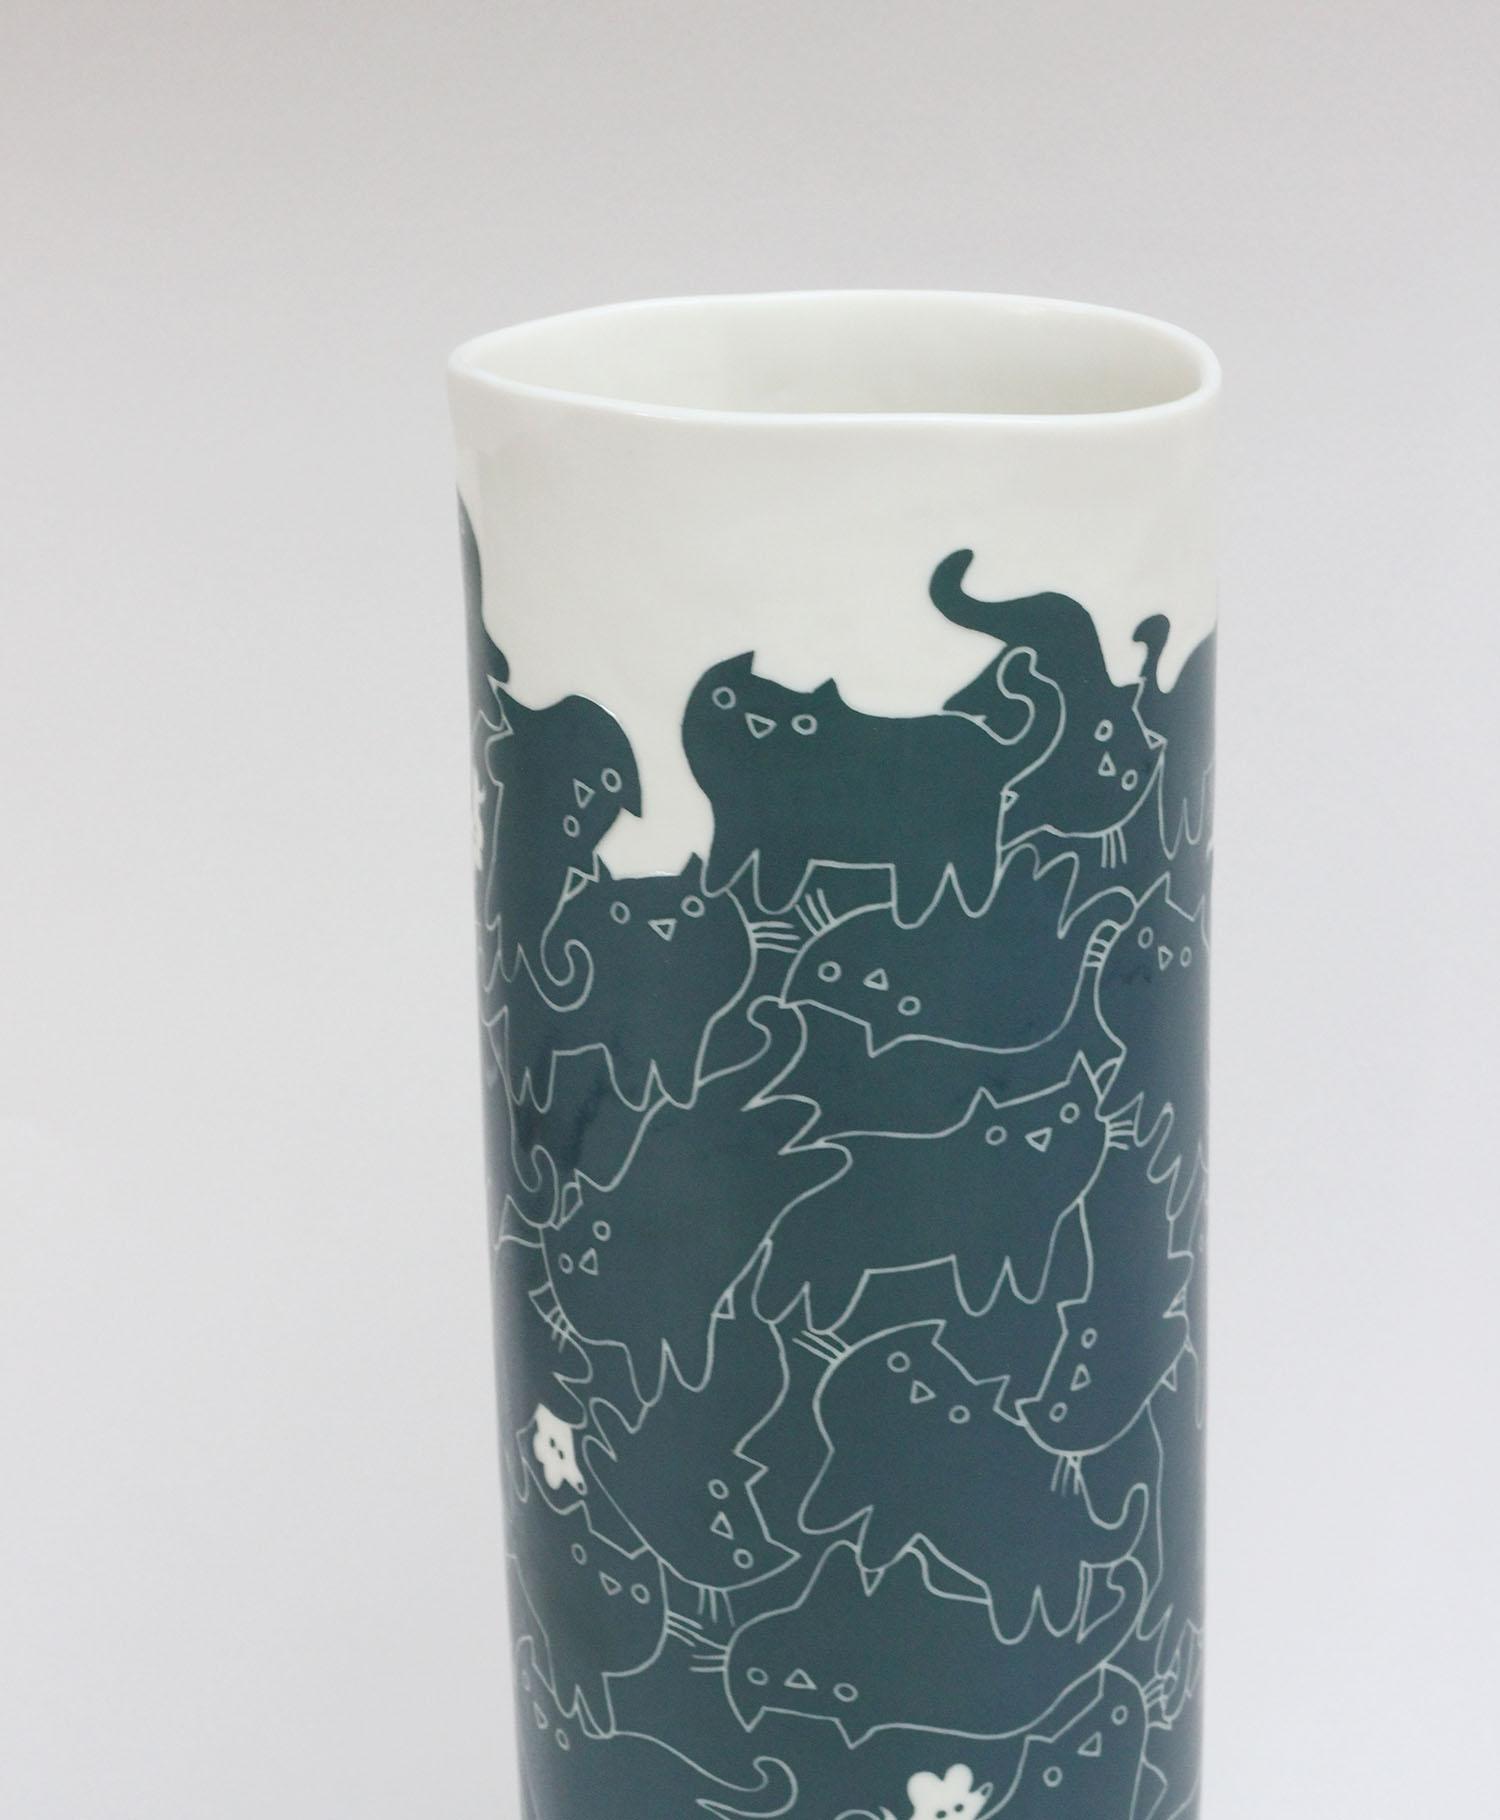 Vase entrechats Detail 2 Charlotte Heurtier 2017.jpg